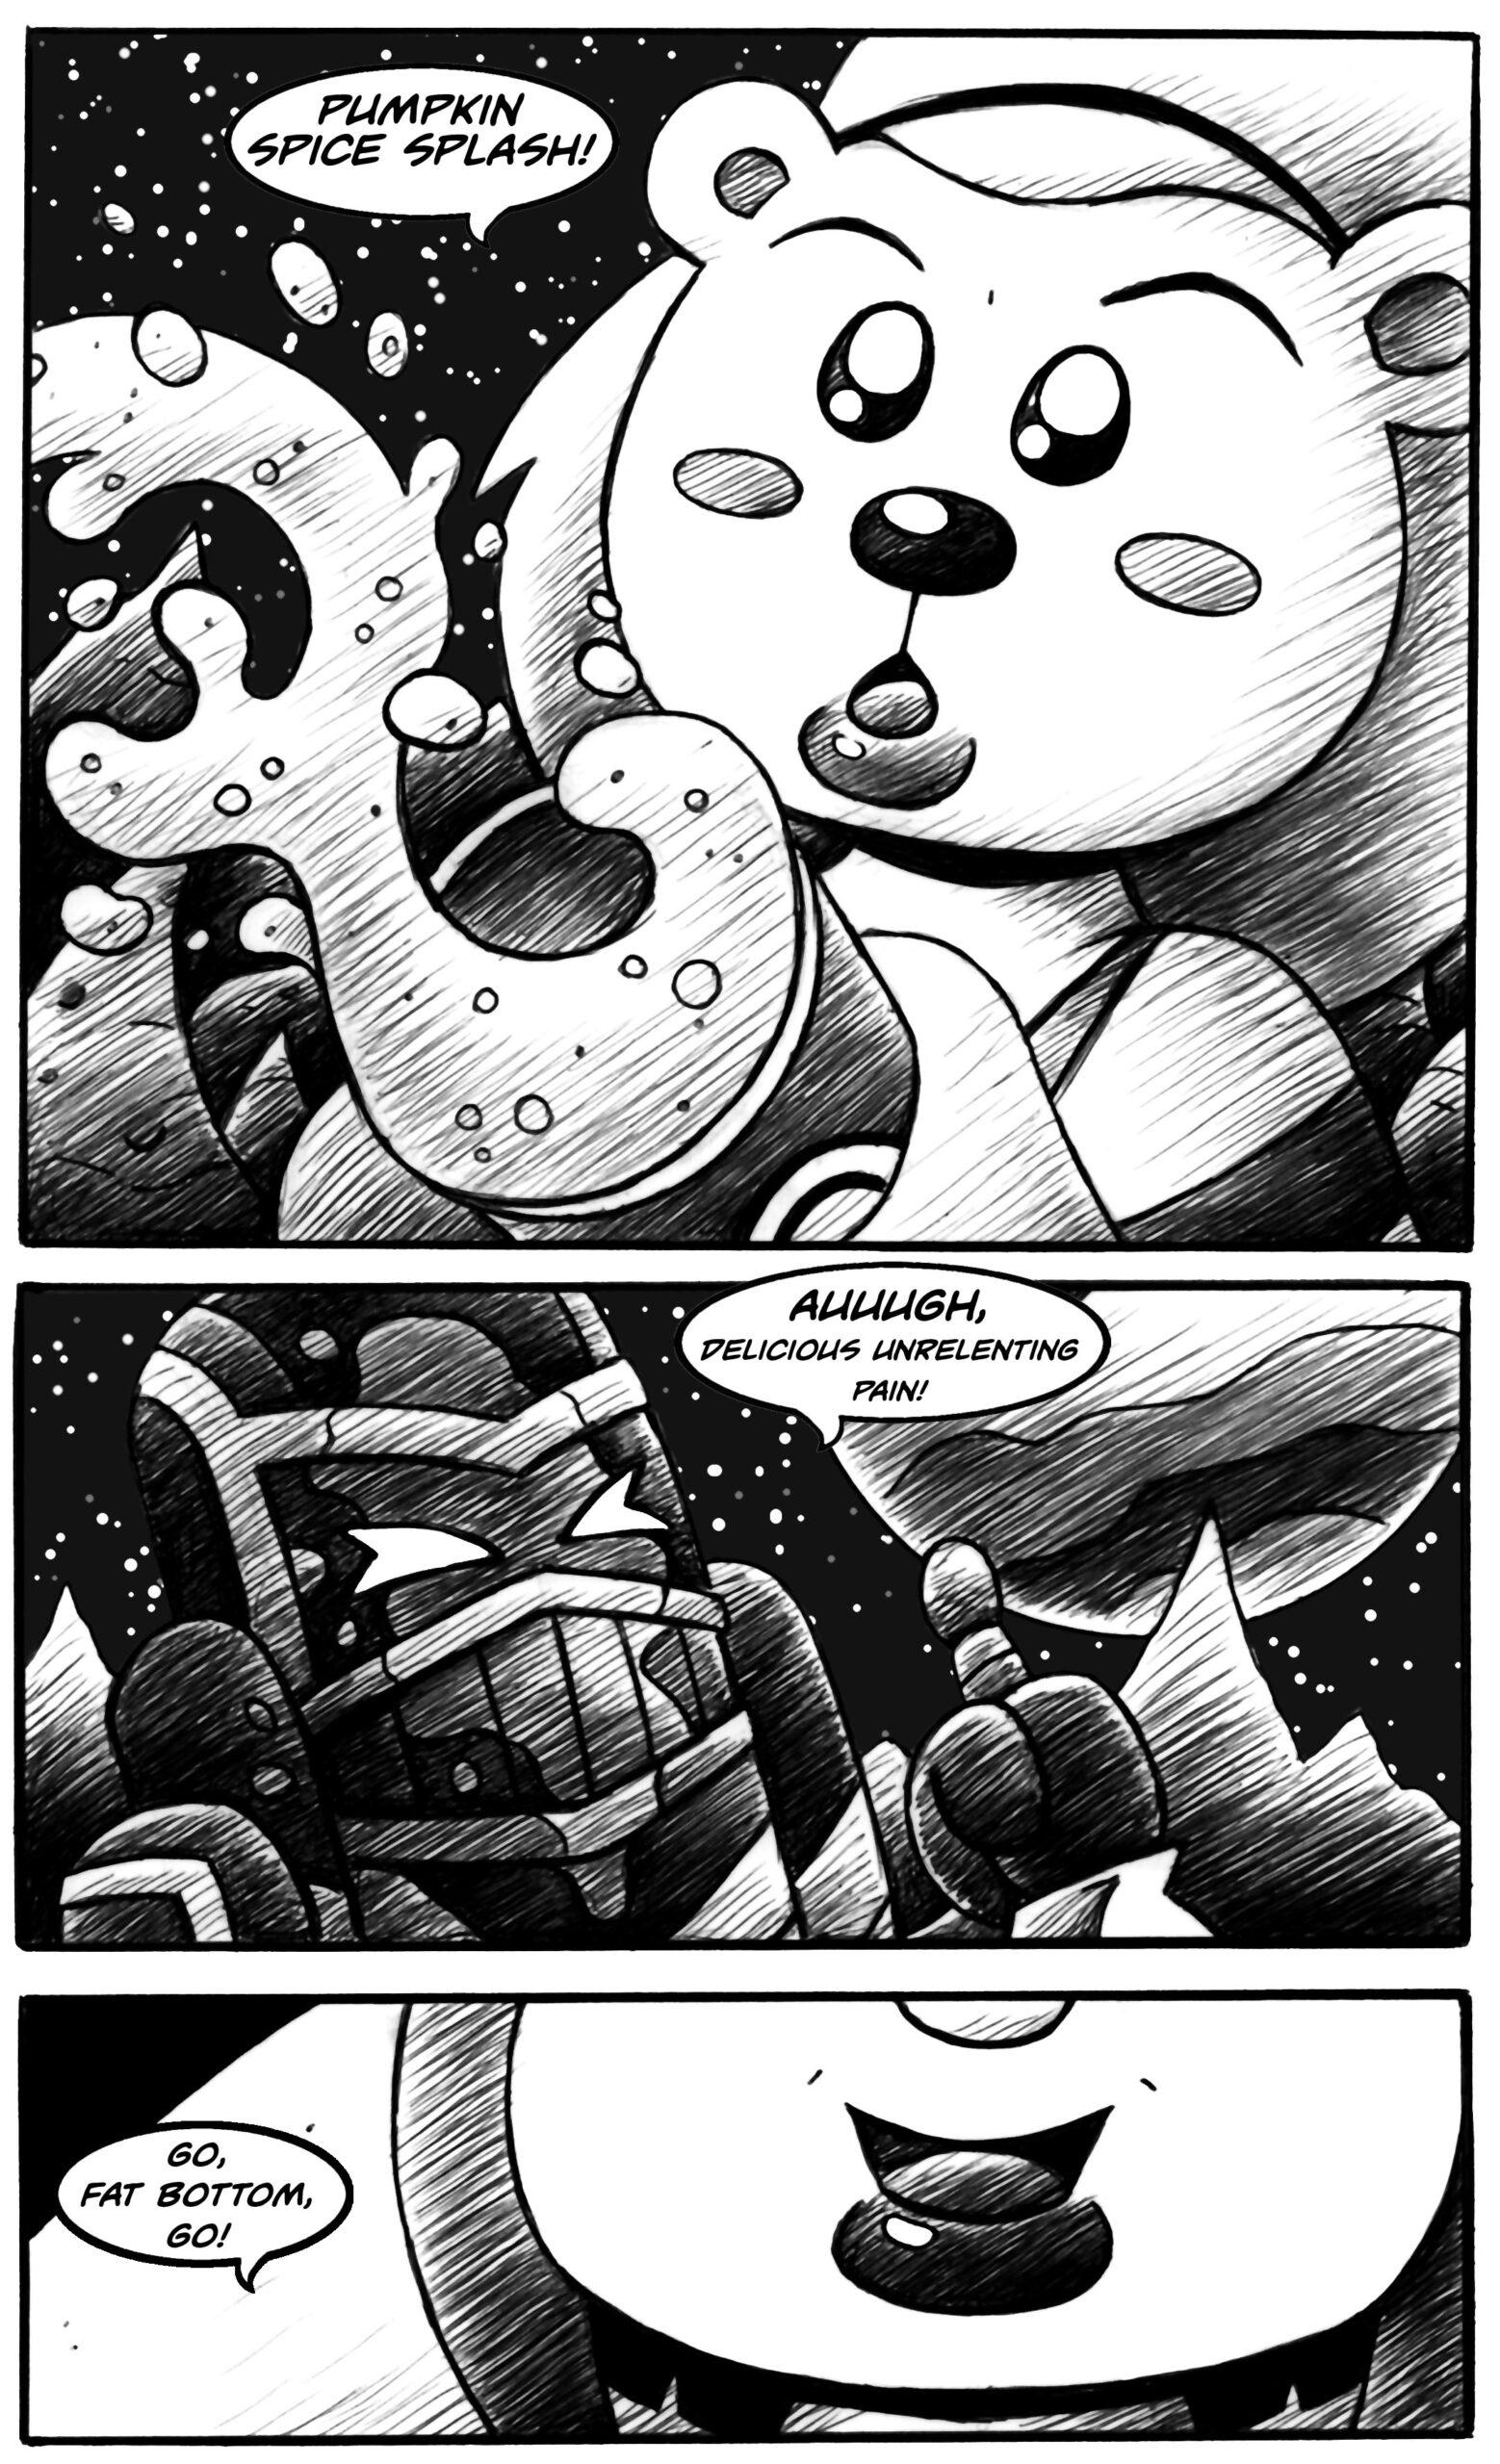 Wayfarer Rendezvous: Page 82